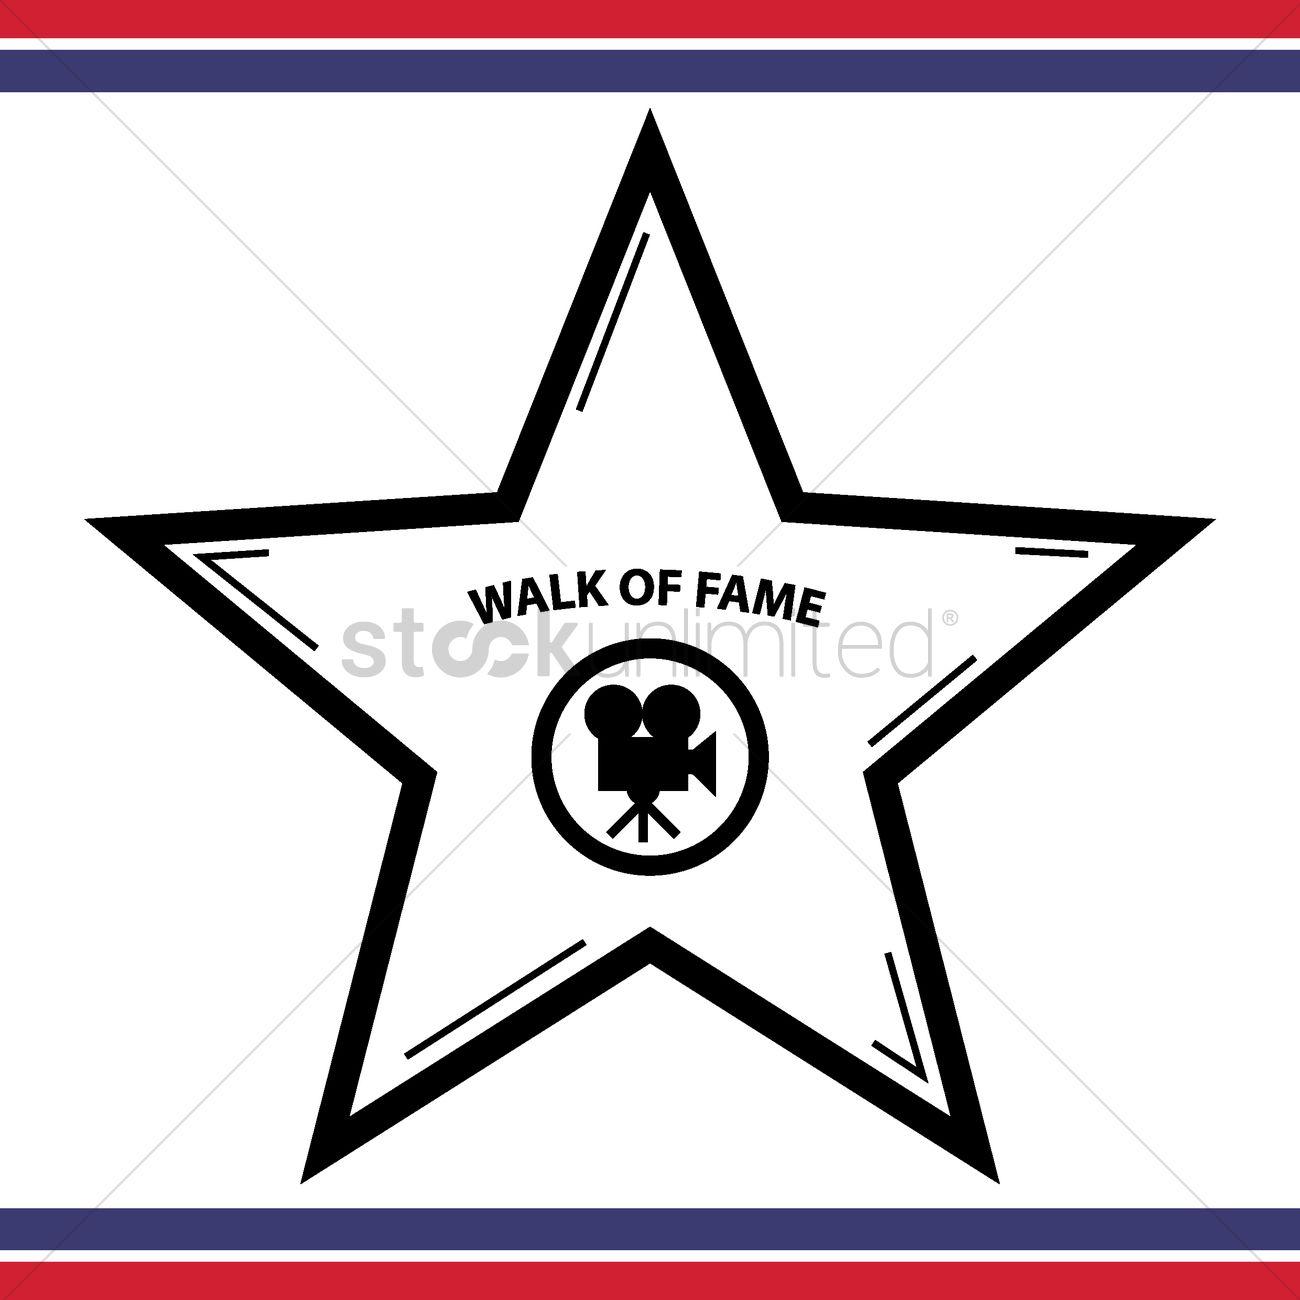 Walk of fame star vector image 1557586 stockunlimited walk of fame star vector graphic freerunsca Choice Image